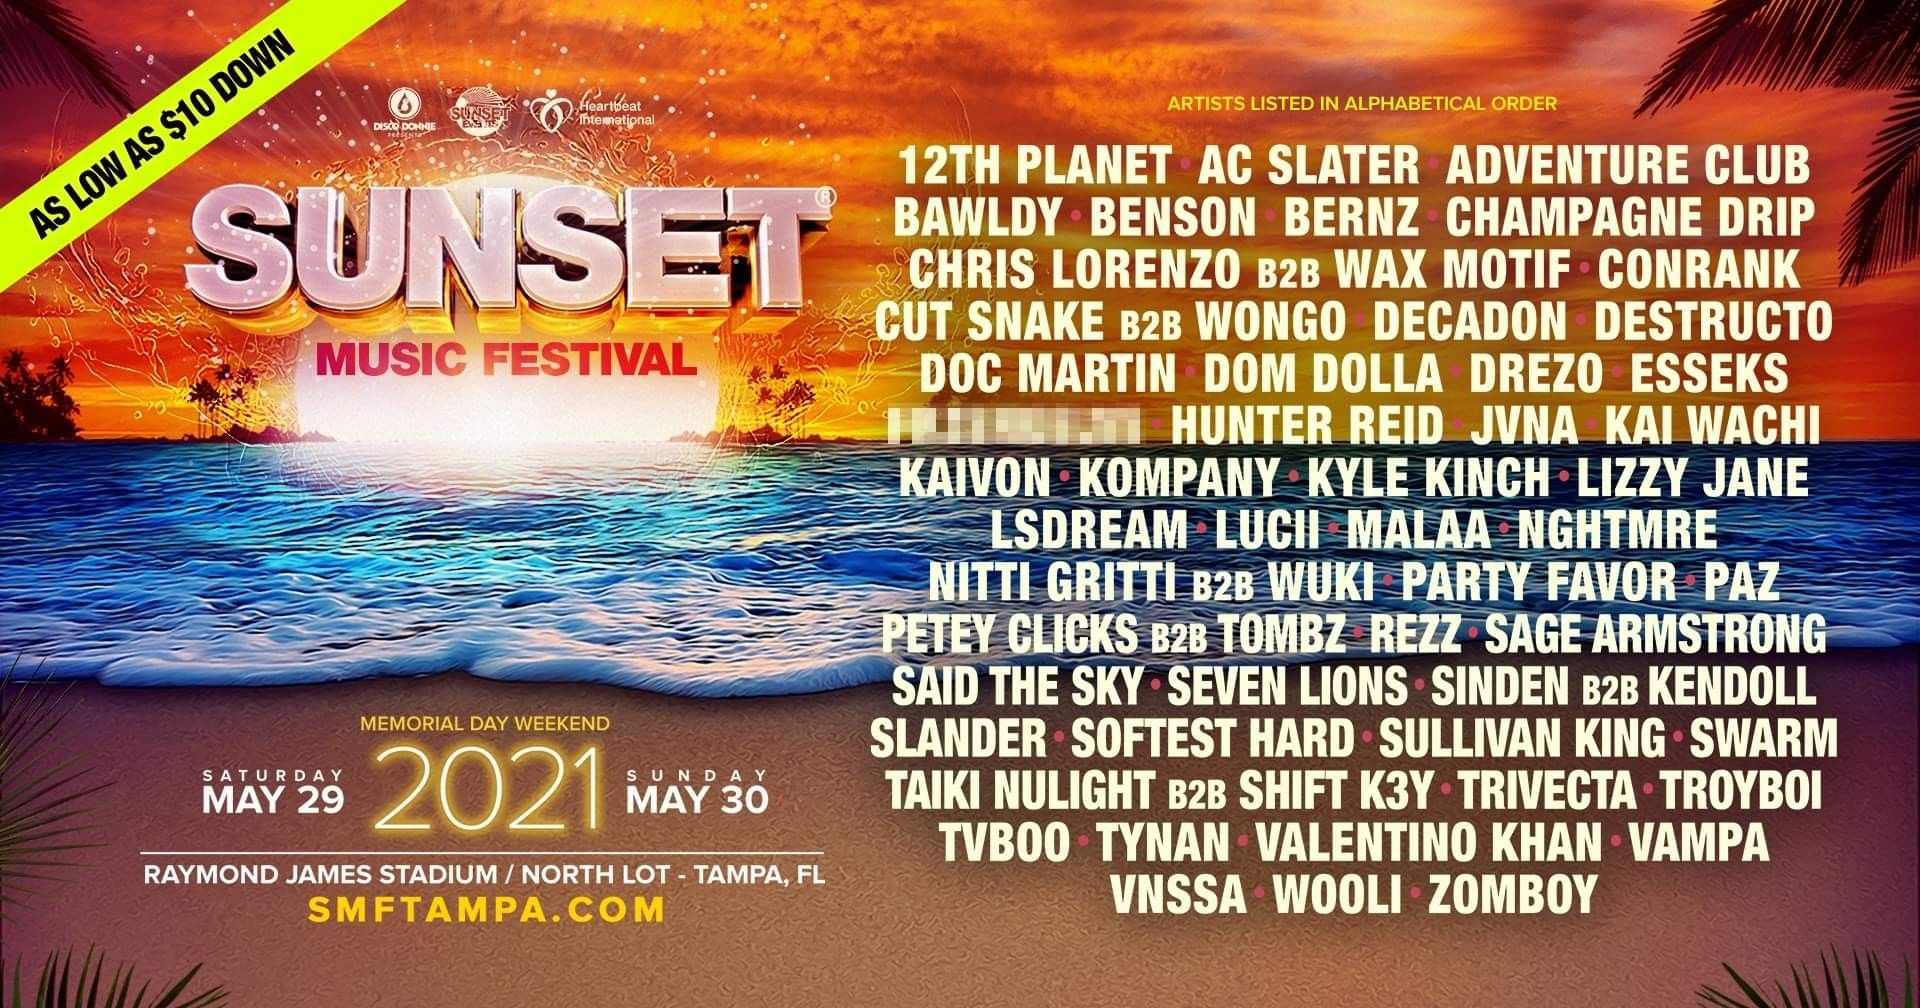 Sunset Music Festival 2021 Discount Ticket Promo Code Sunset Music Festival Music Festival Promo Codes